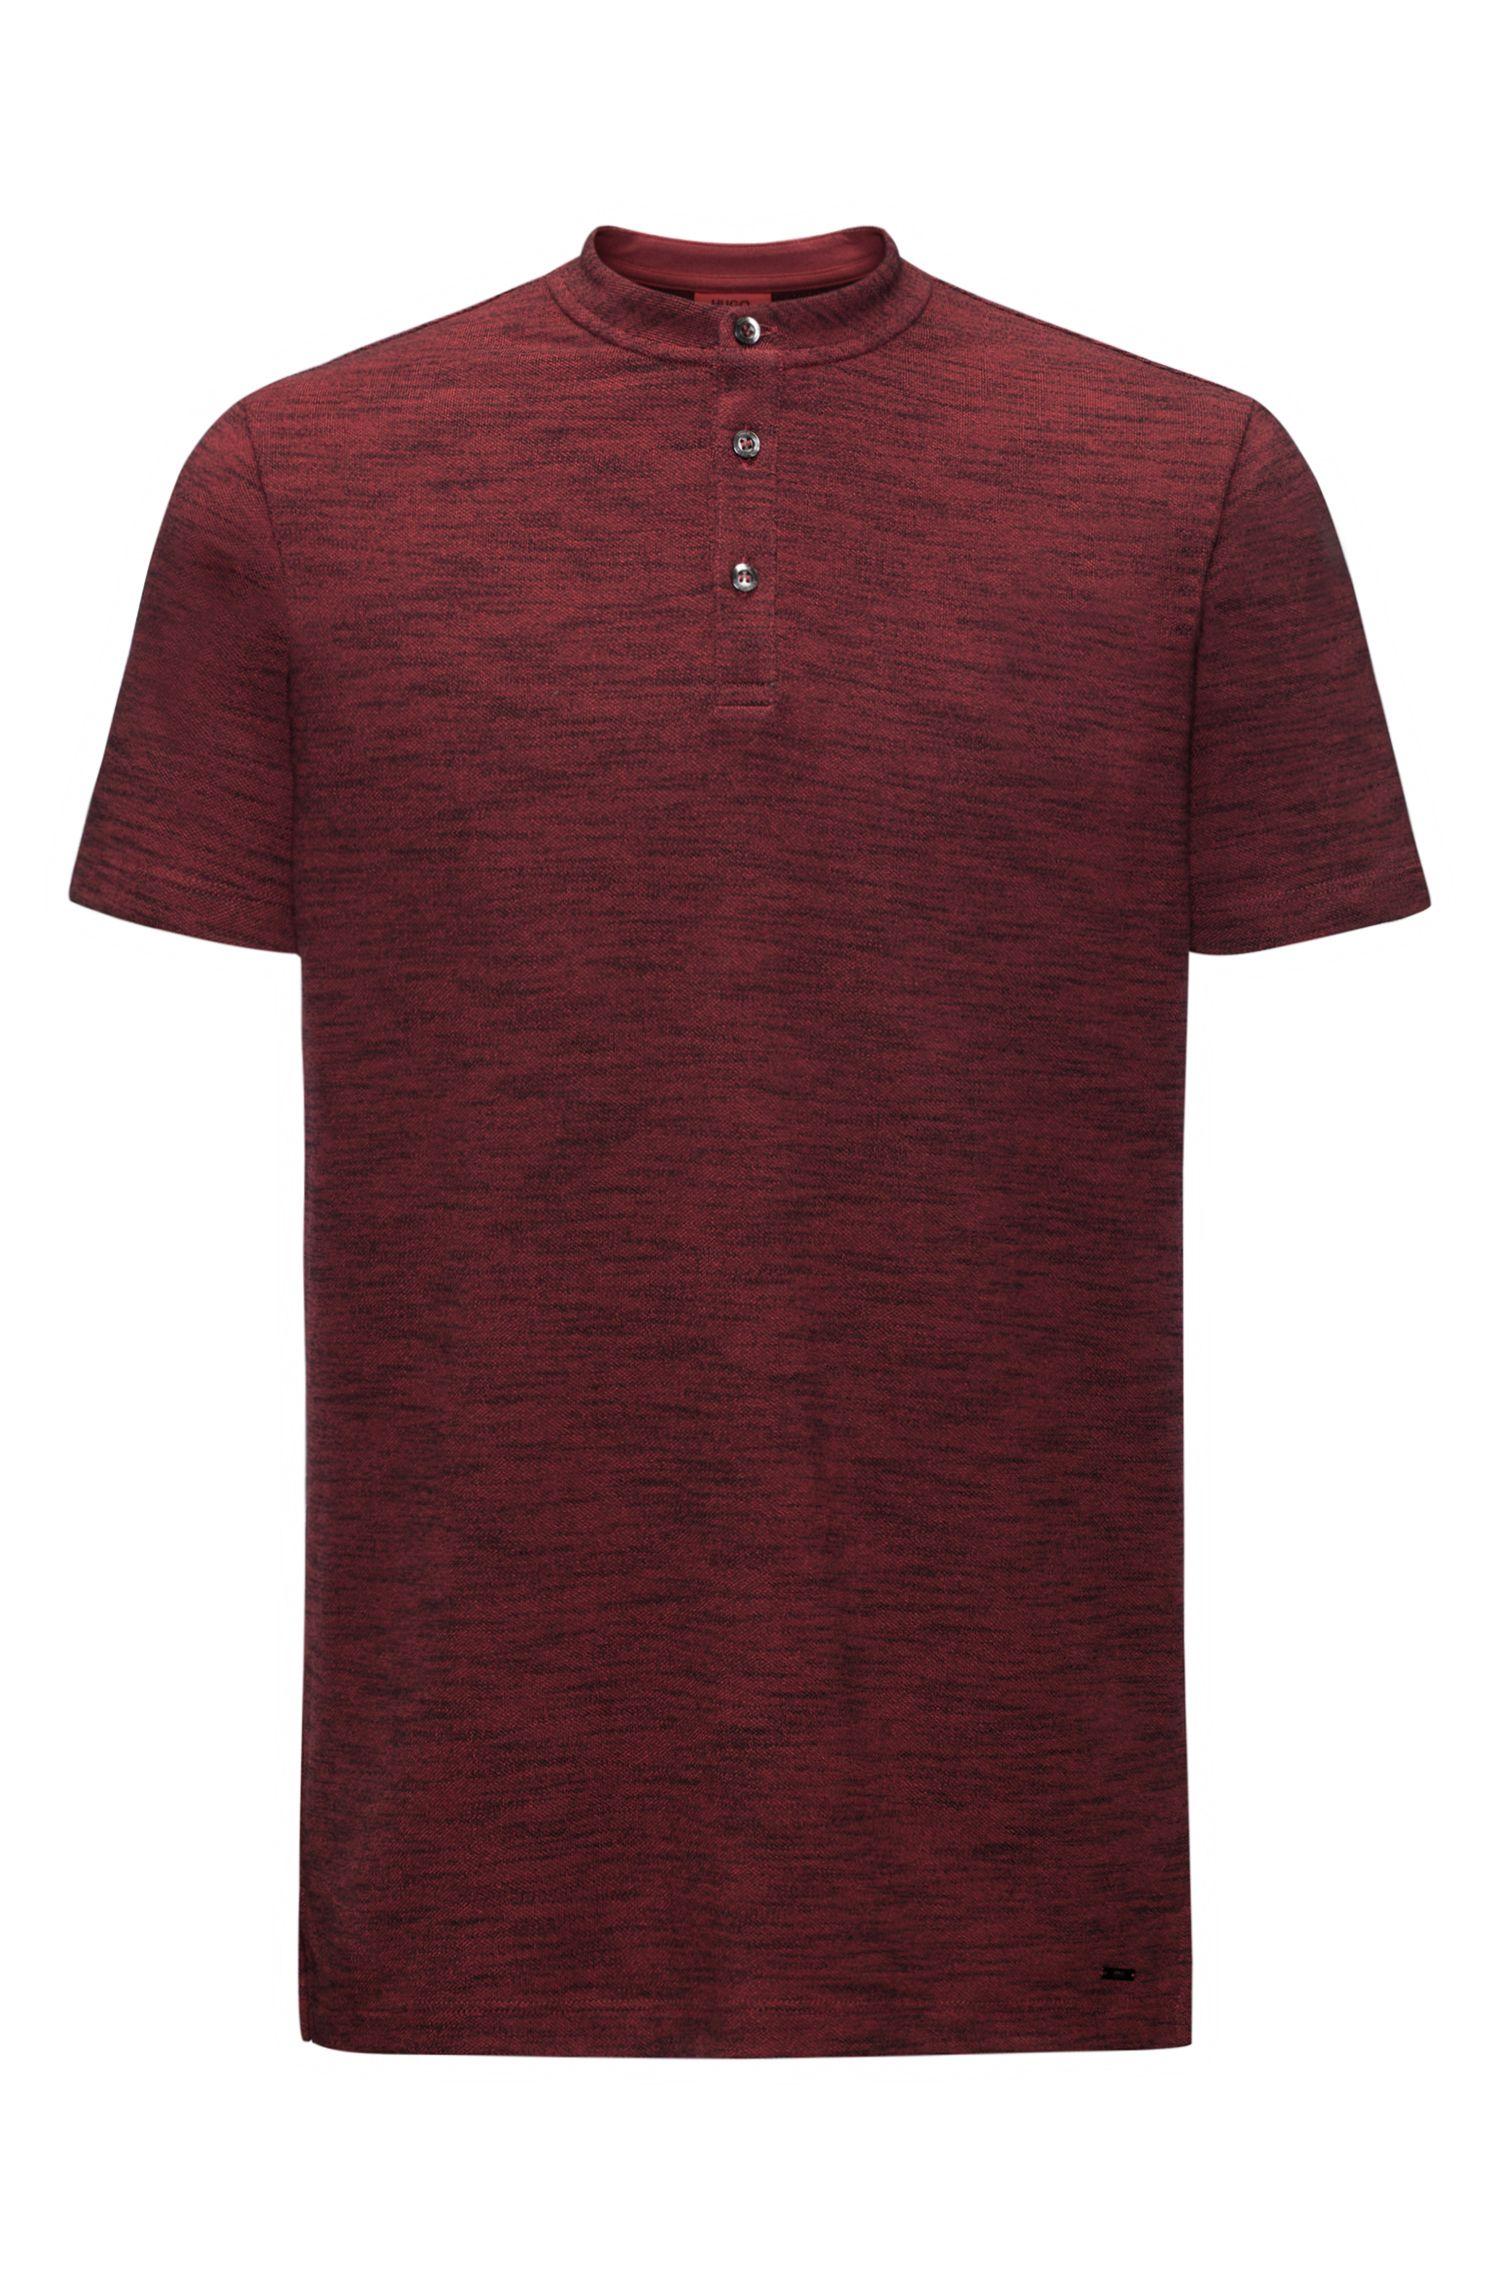 Mouline Oxford Cotton Henley Shirt, Regular Fit | Dayes, Dark Red